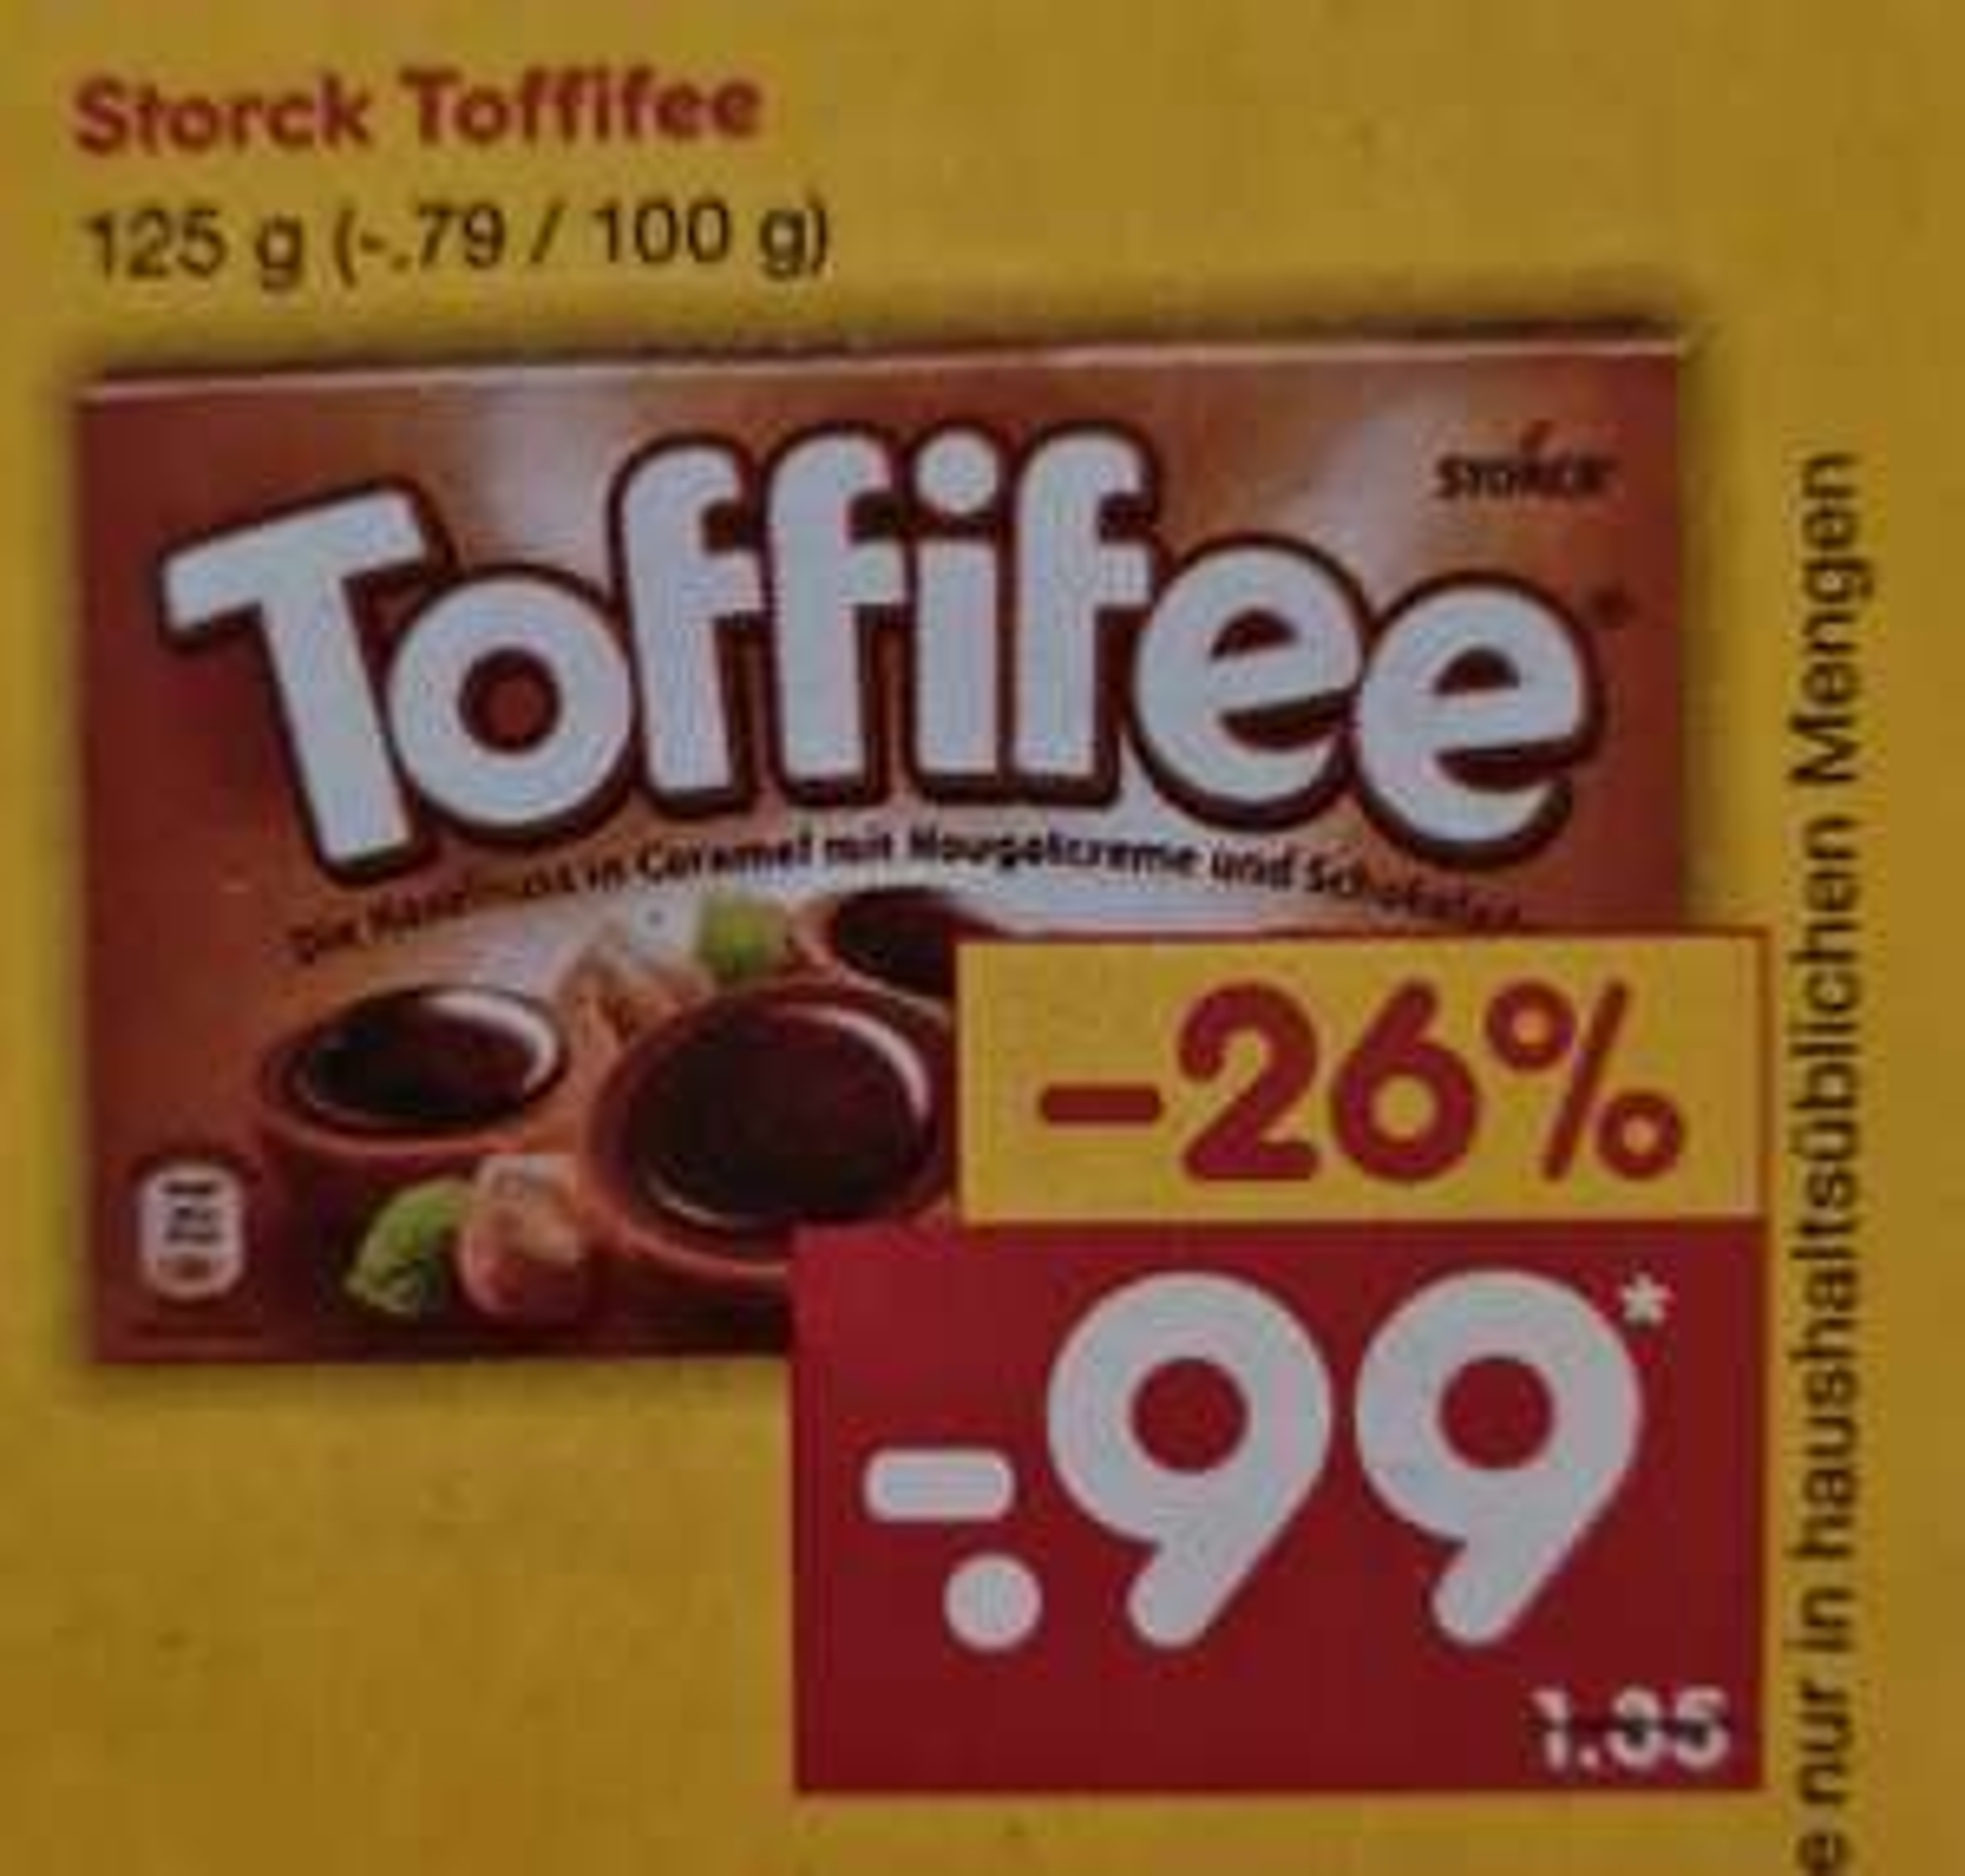 Storck Toffifee 125 g ab 01.03 Netto